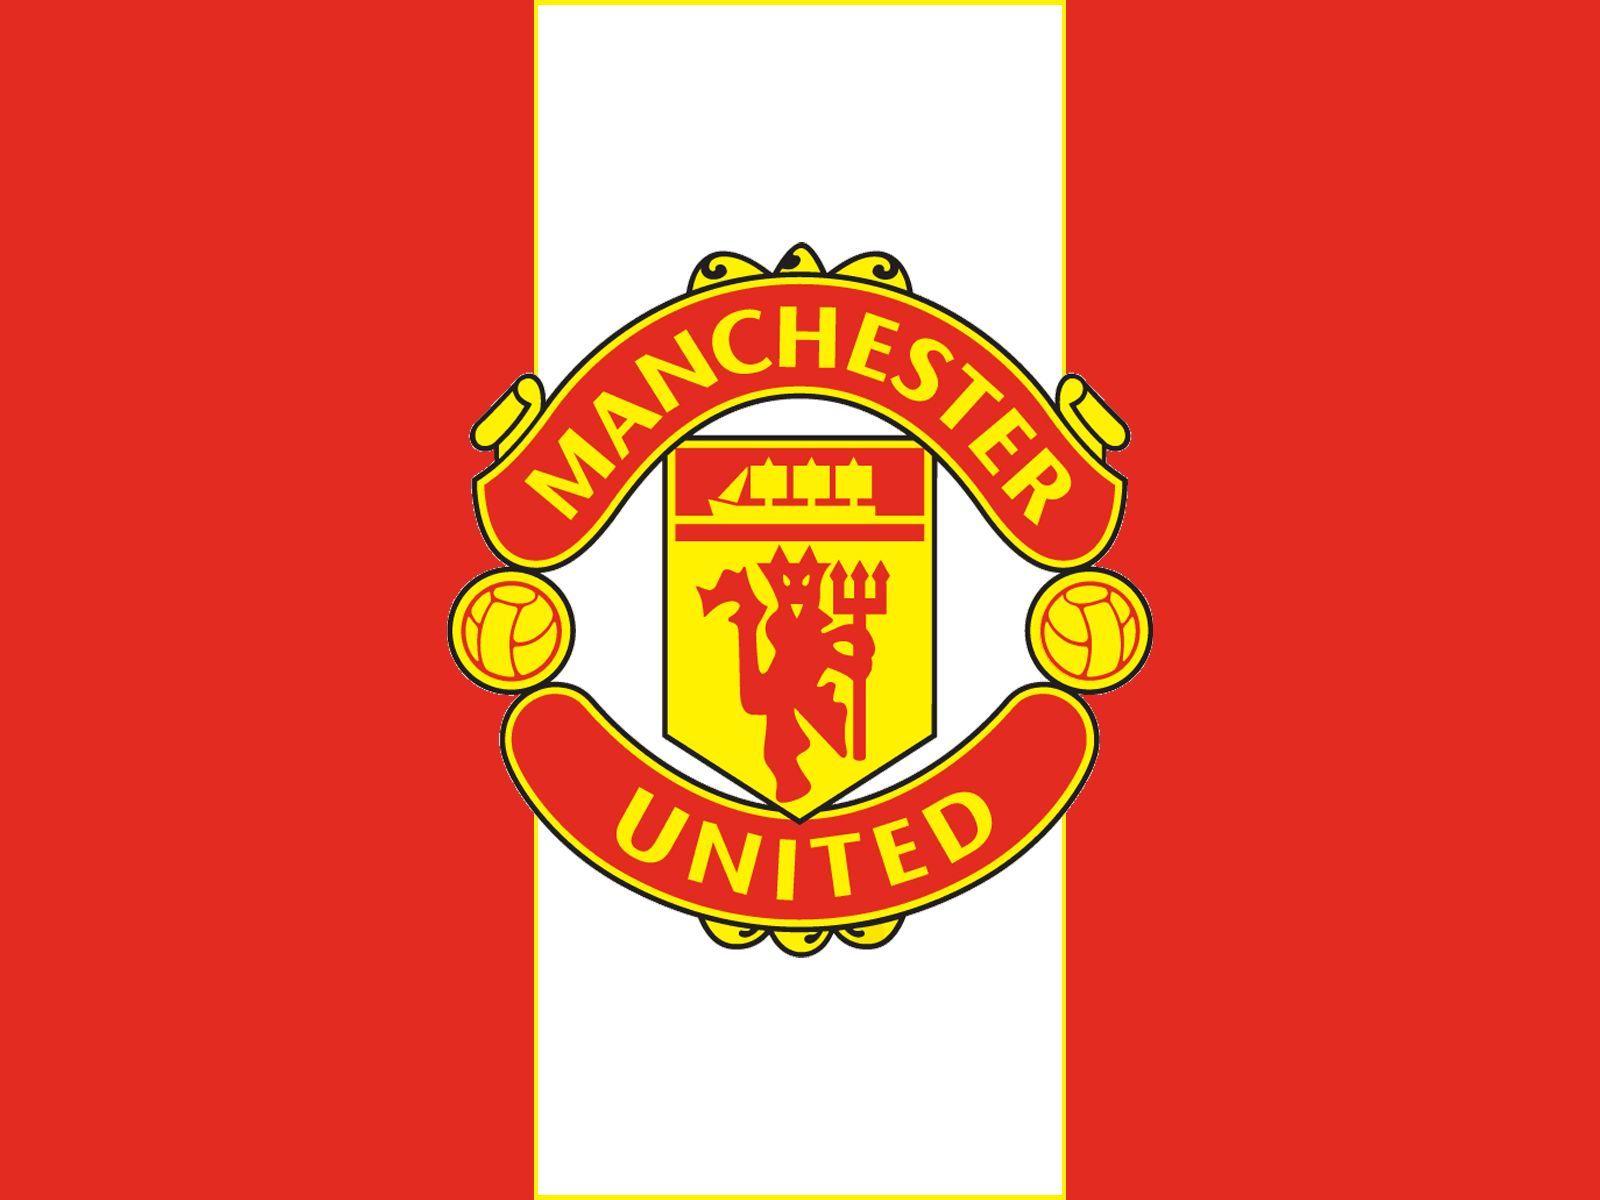 Wallpaper Klub Sepak Bola Manchester United Logo 2019 541827 Hd Wallpaper Backgrounds Download